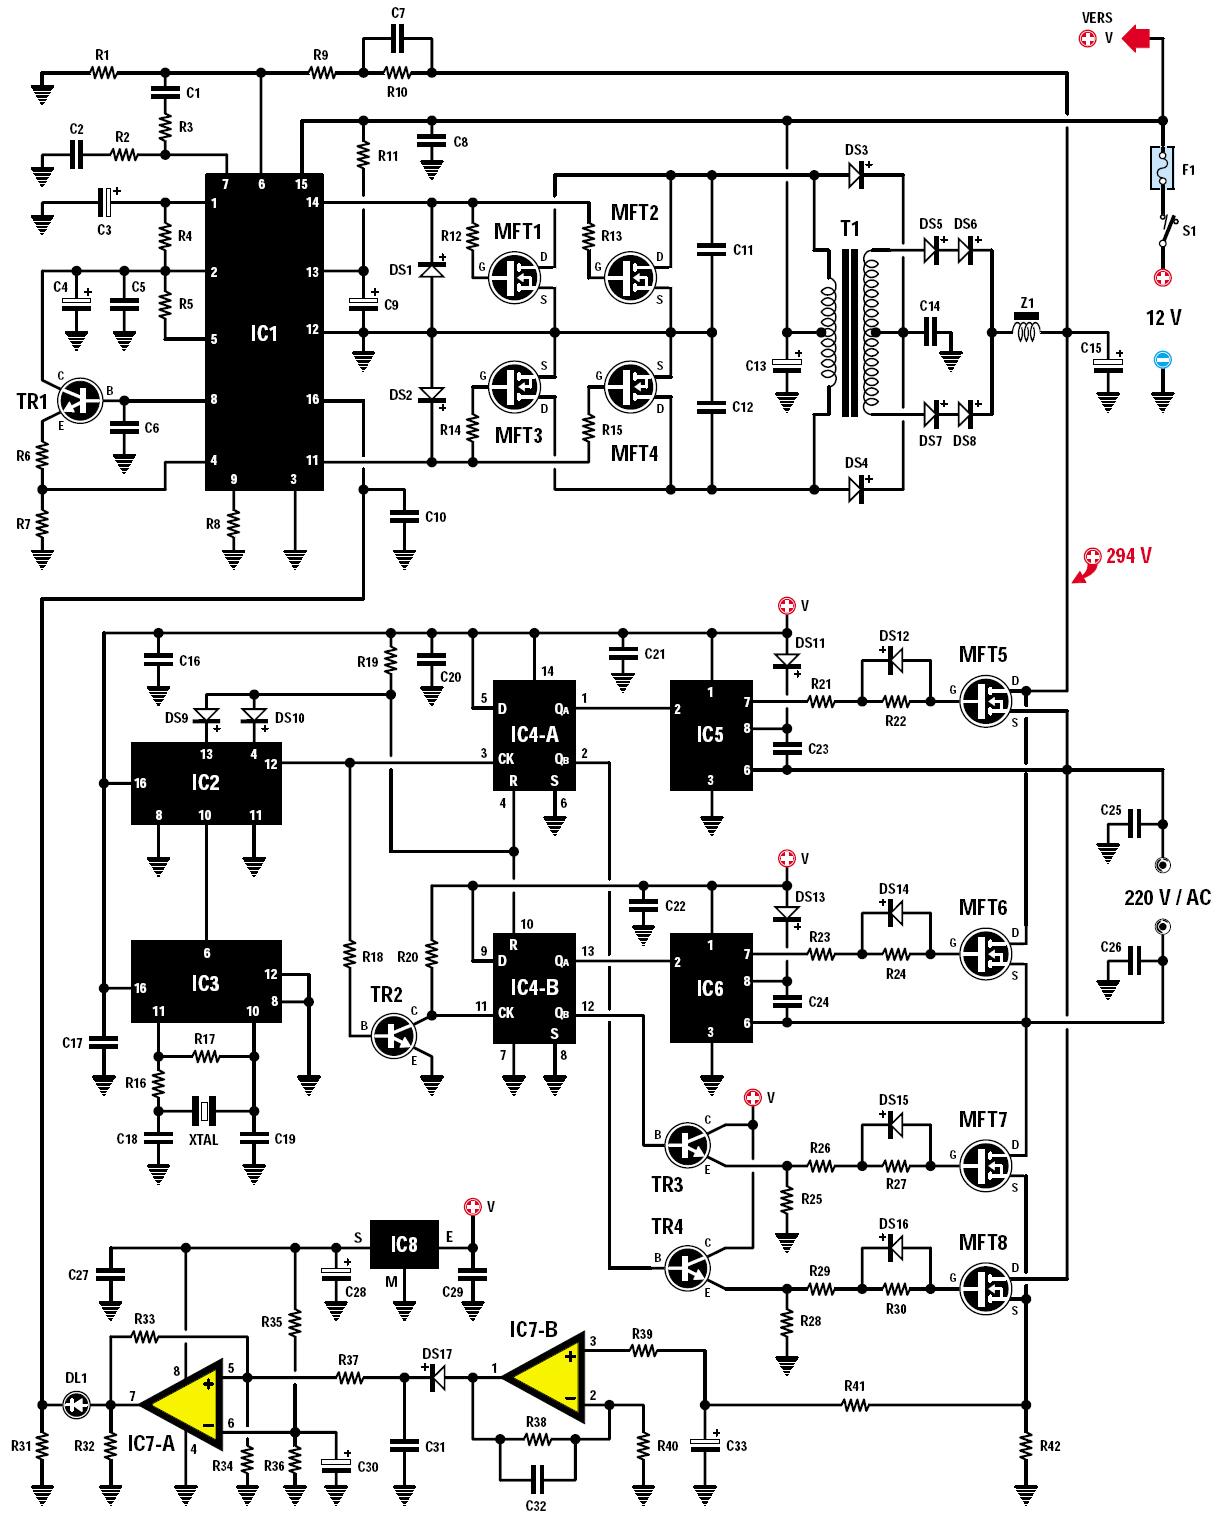 un convertisseur 12 volts continus 220 volts alternatifs 160 watts 50 hertz schema. Black Bedroom Furniture Sets. Home Design Ideas